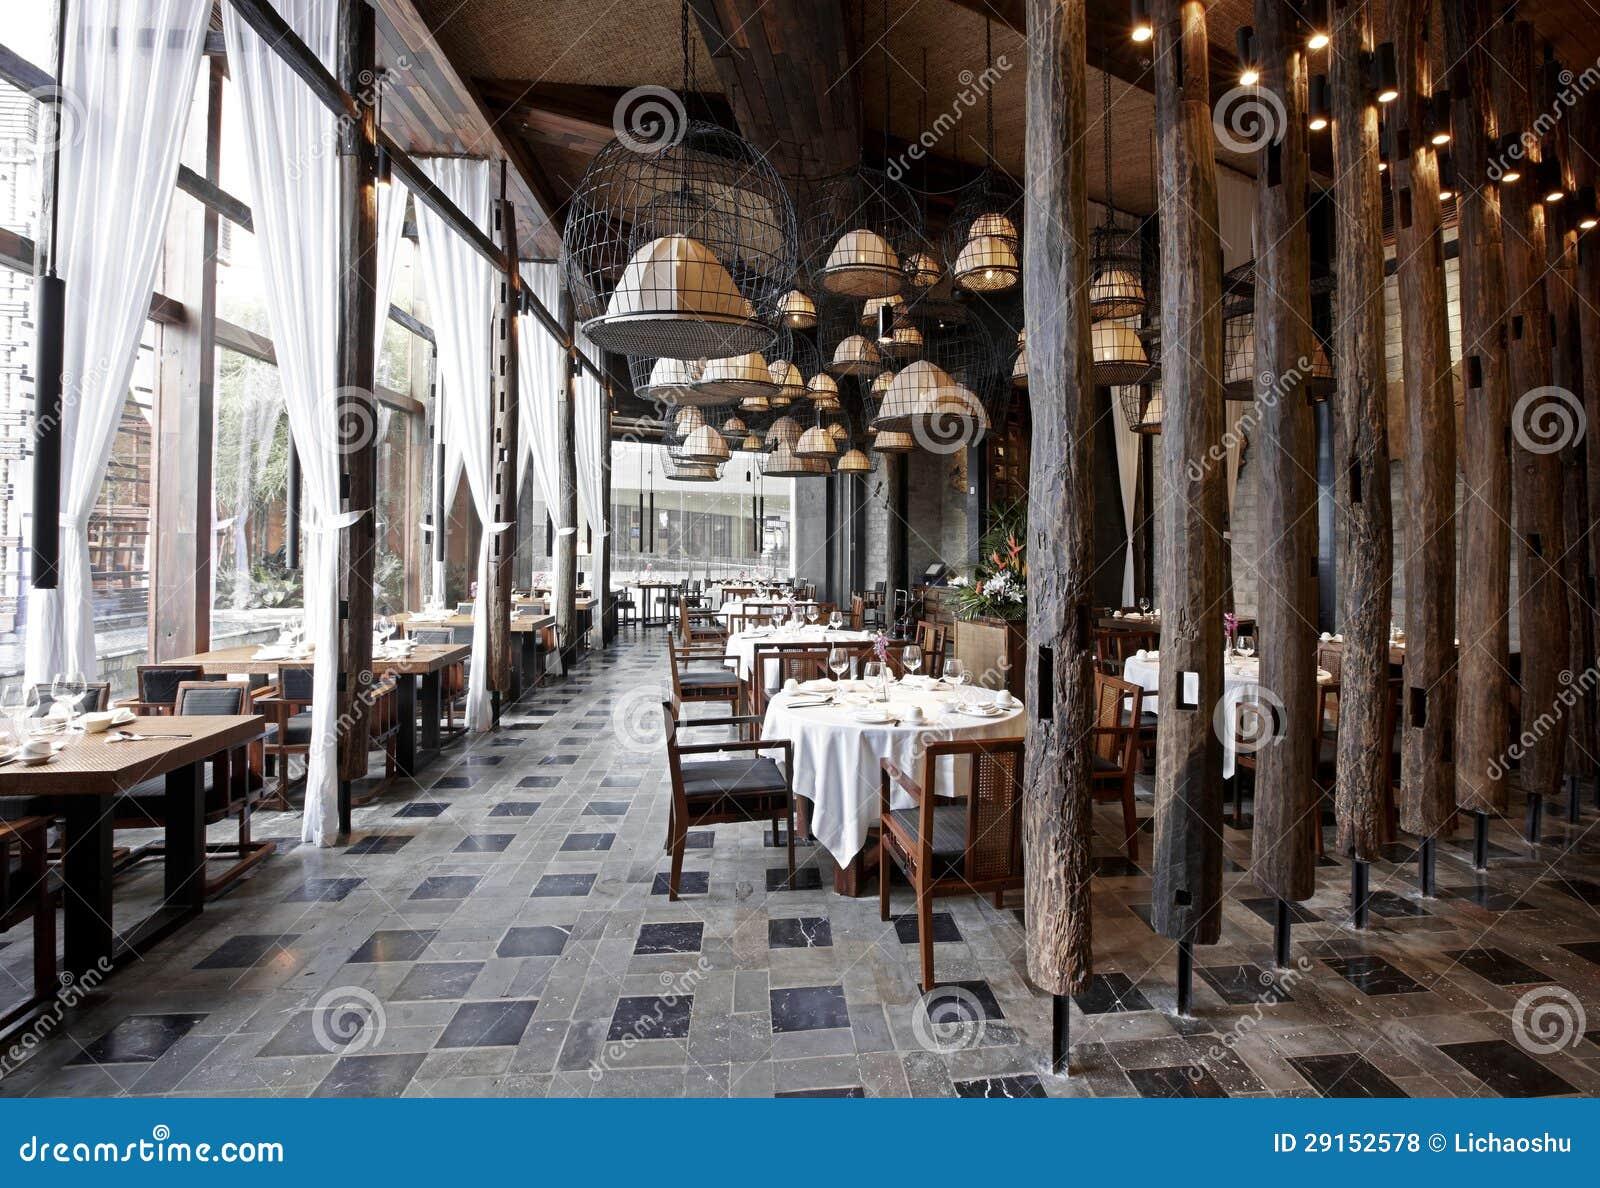 Asian restaurant southeast commit error